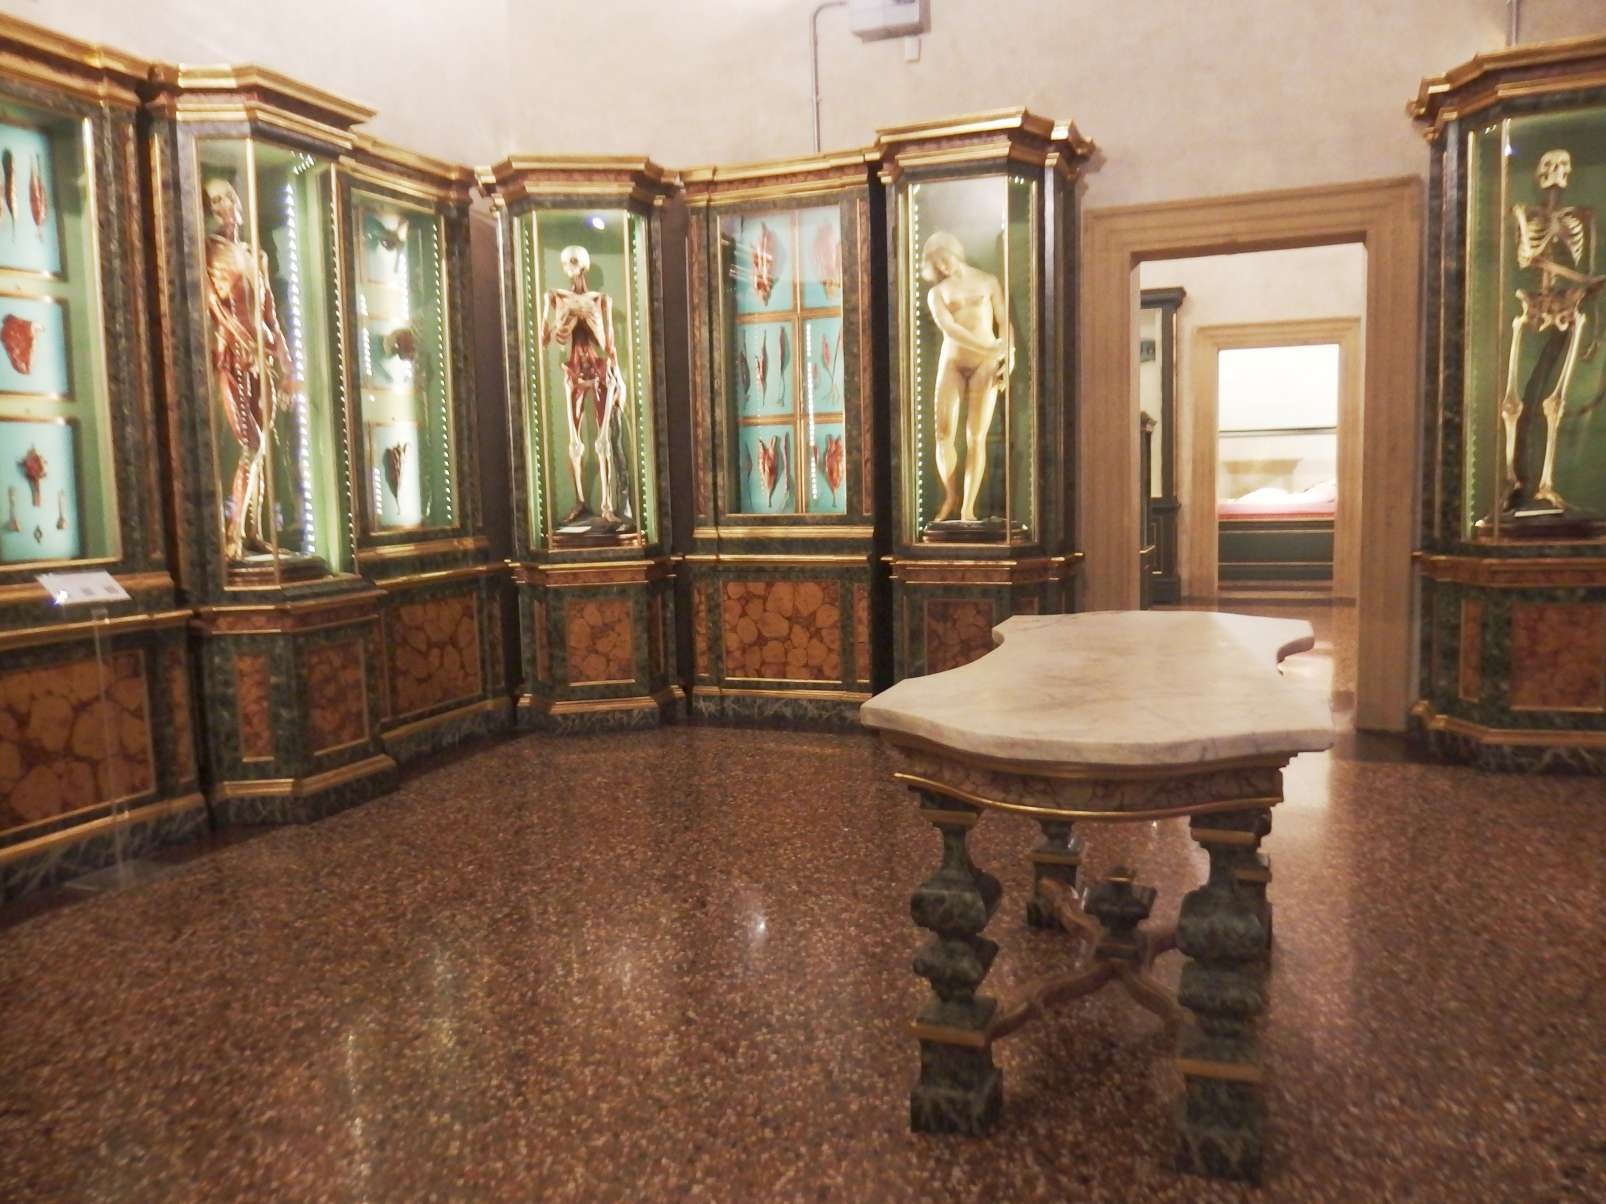 Museo di Palazzo Poggi - Bologna - anatomical wax models